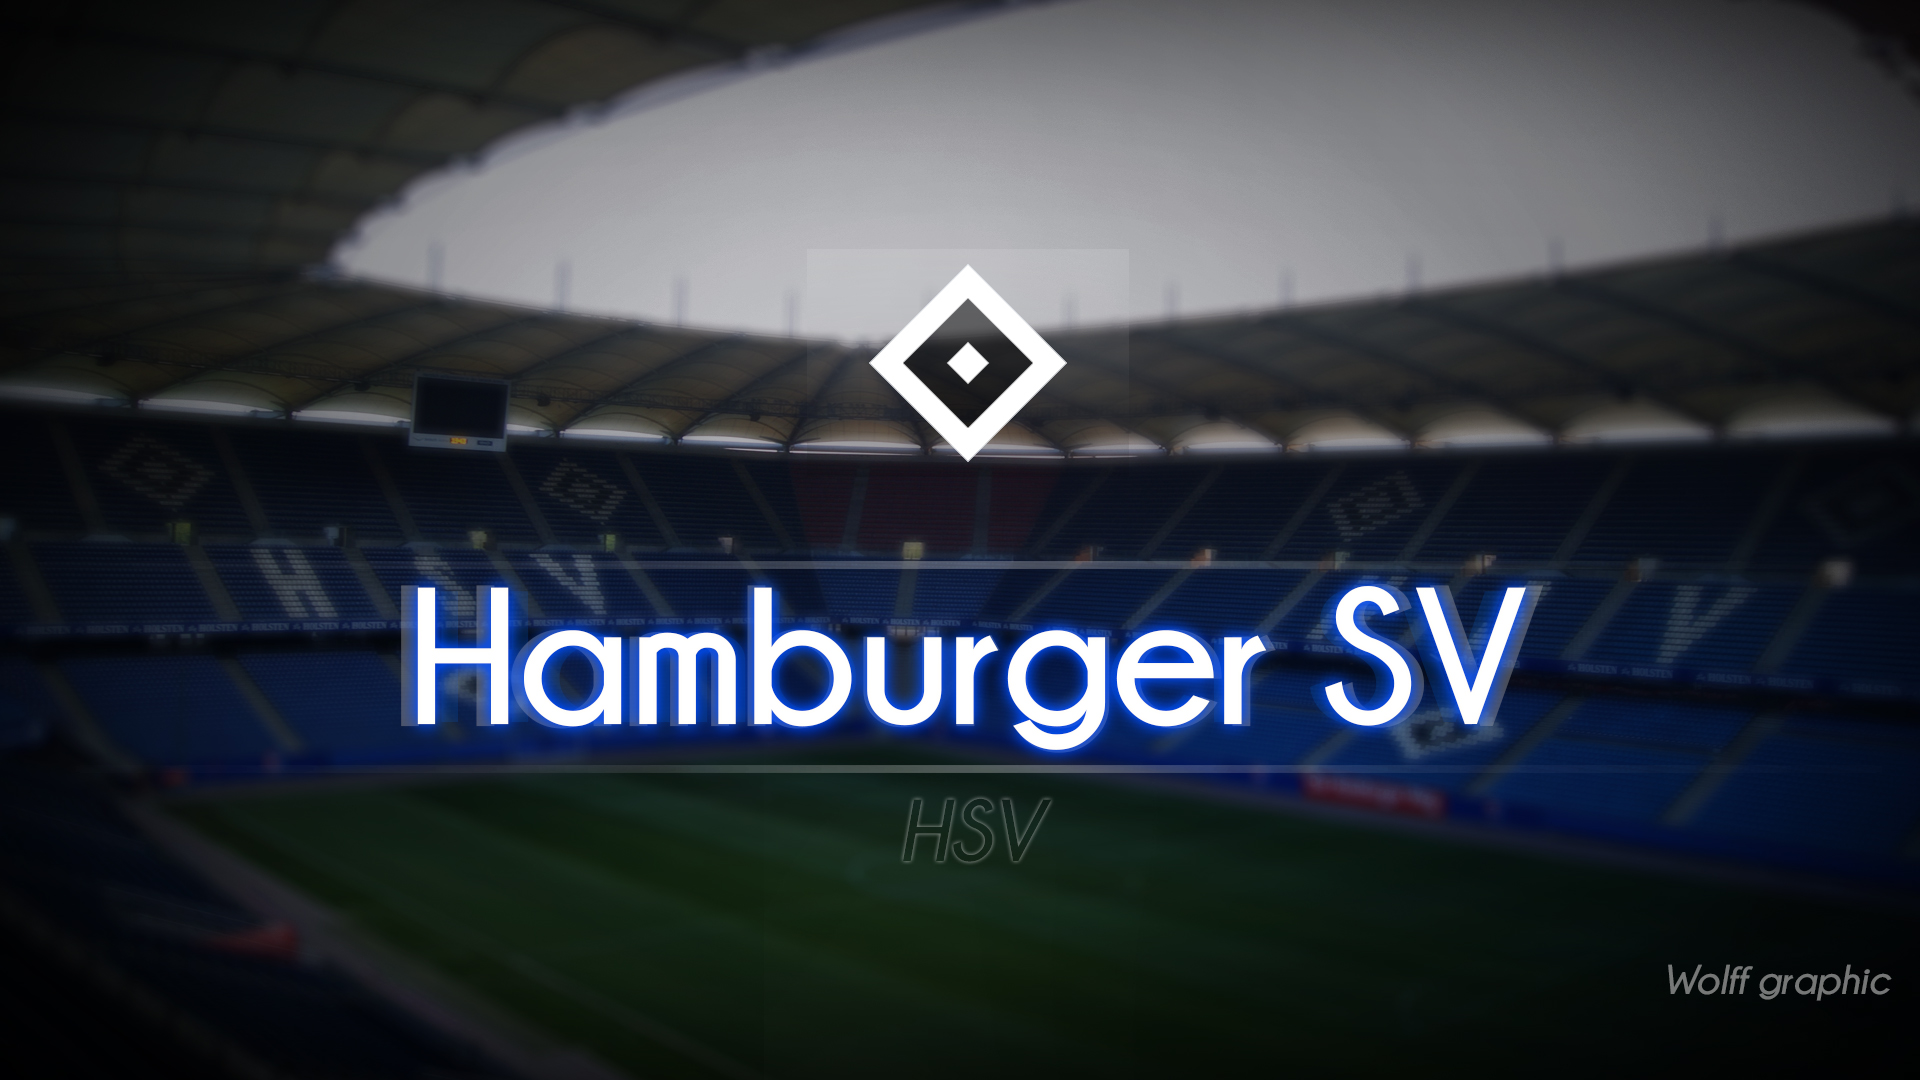 Hamburger SV: Hamburer SV Wallpaper By Wolff10 On DeviantArt